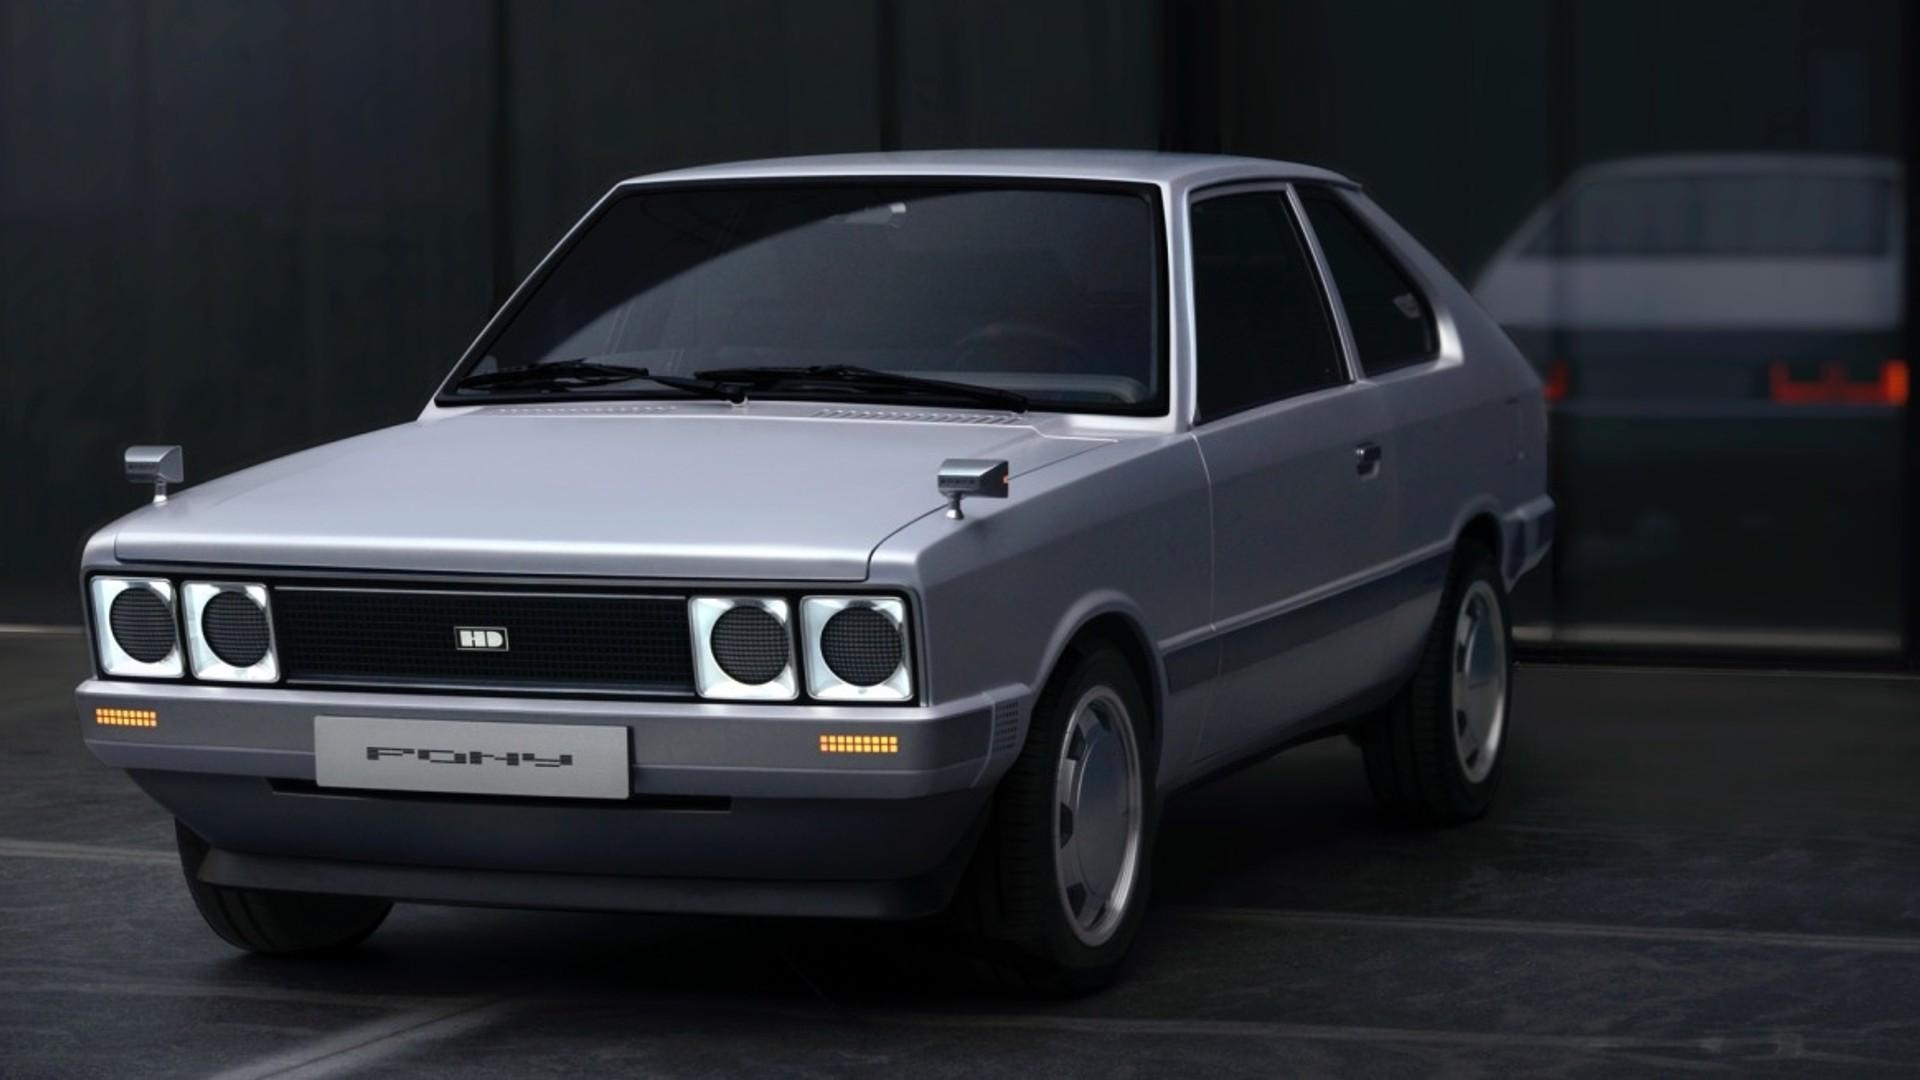 To πρώτο αυτοκίνητο της Hyundai λεγόταν Pony και επιστρέφει μετά από 45 χρόνια! (pics)